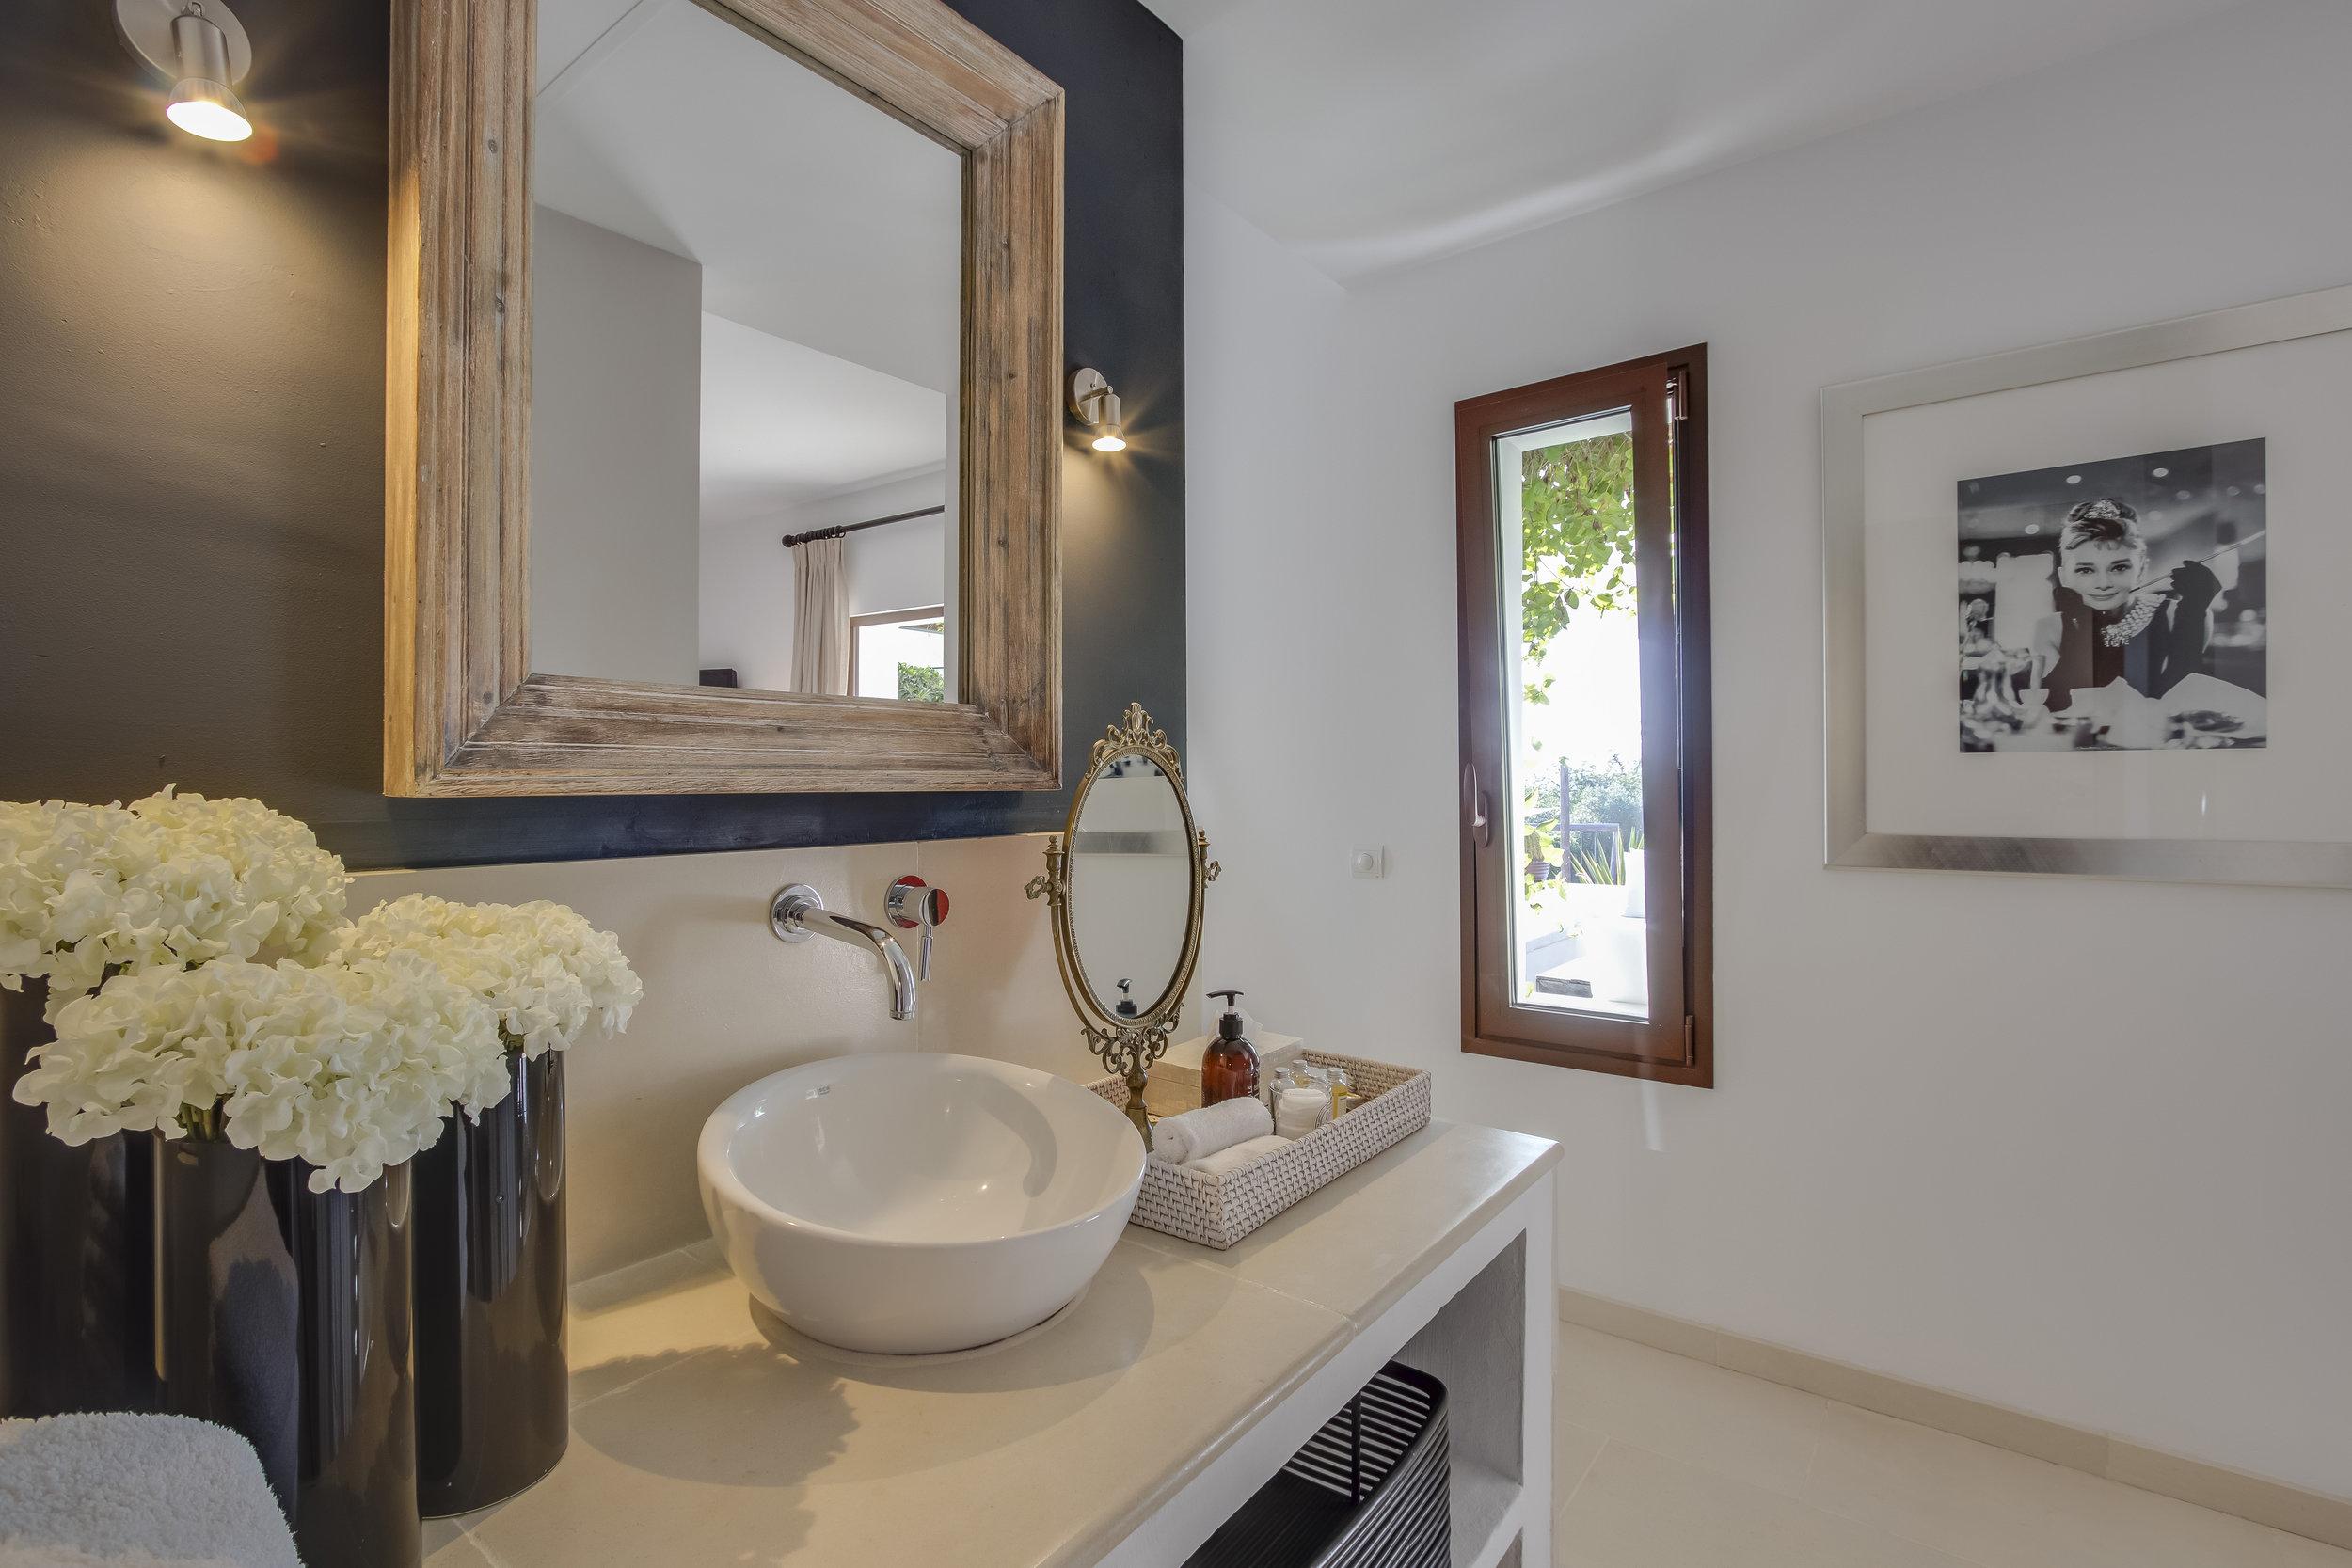 Flock bathroom 1 NEW.jpg